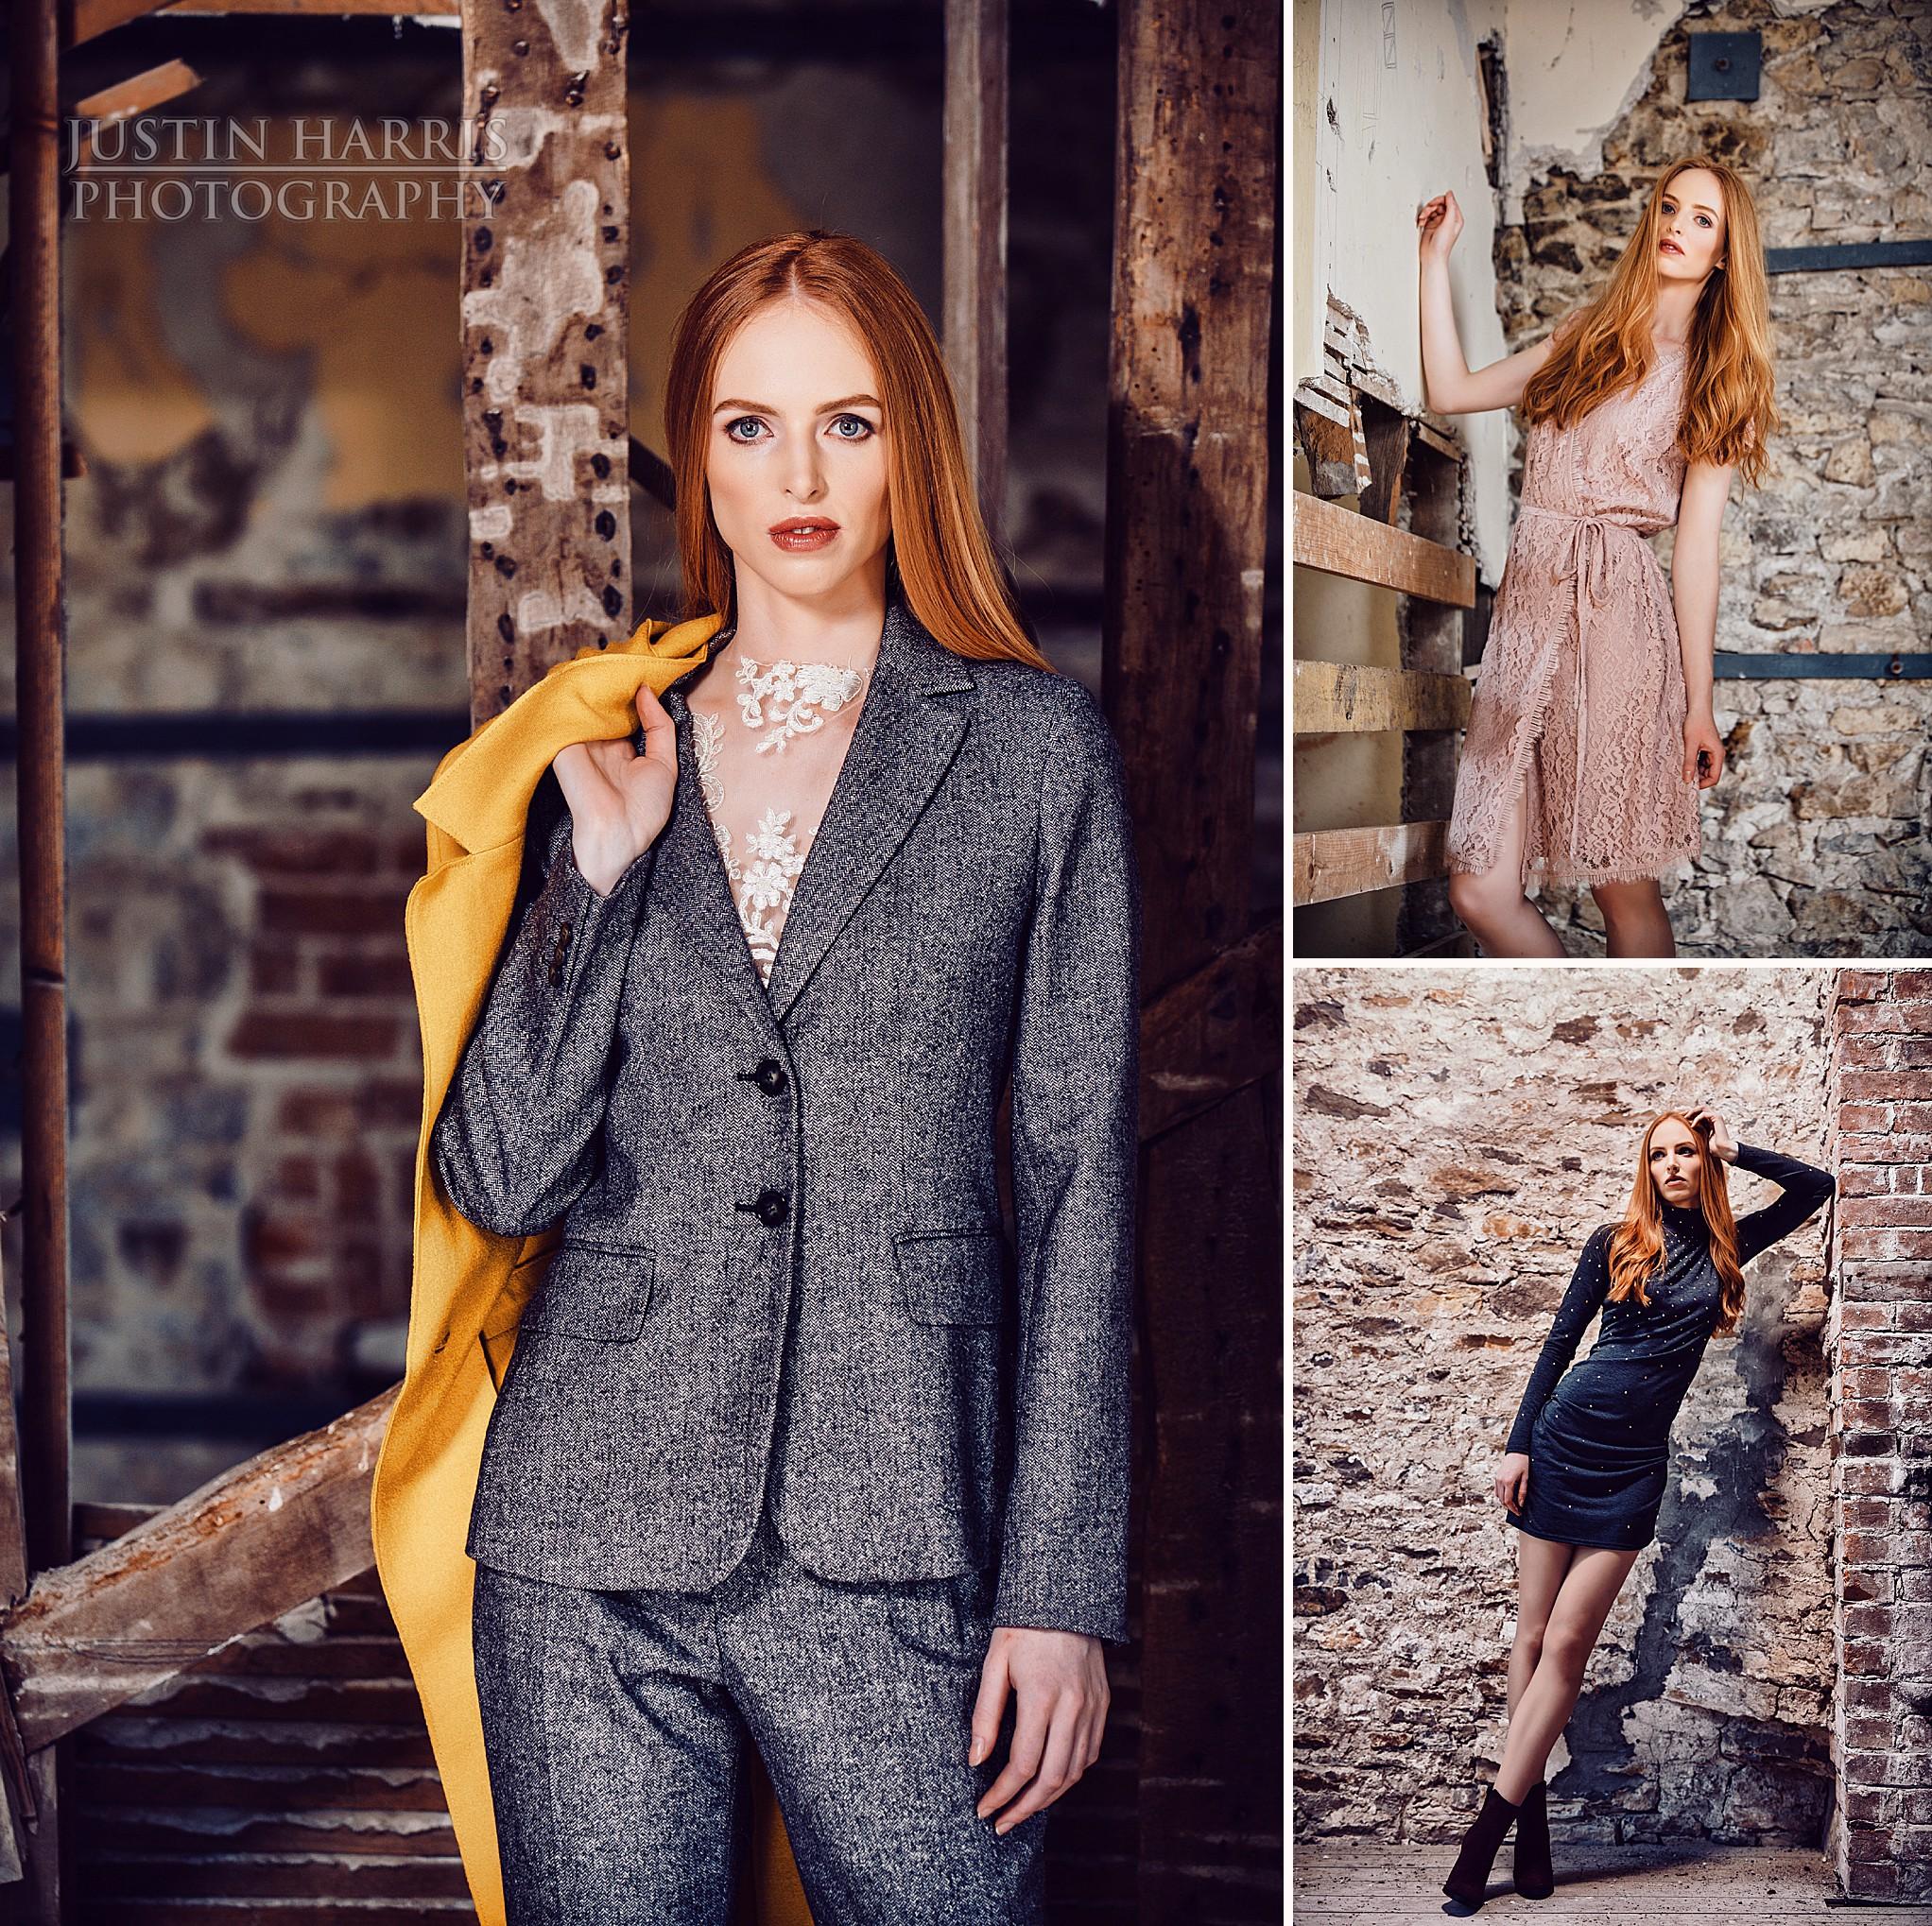 Autumn Leaves Fashion Behind - Carsten Tschach